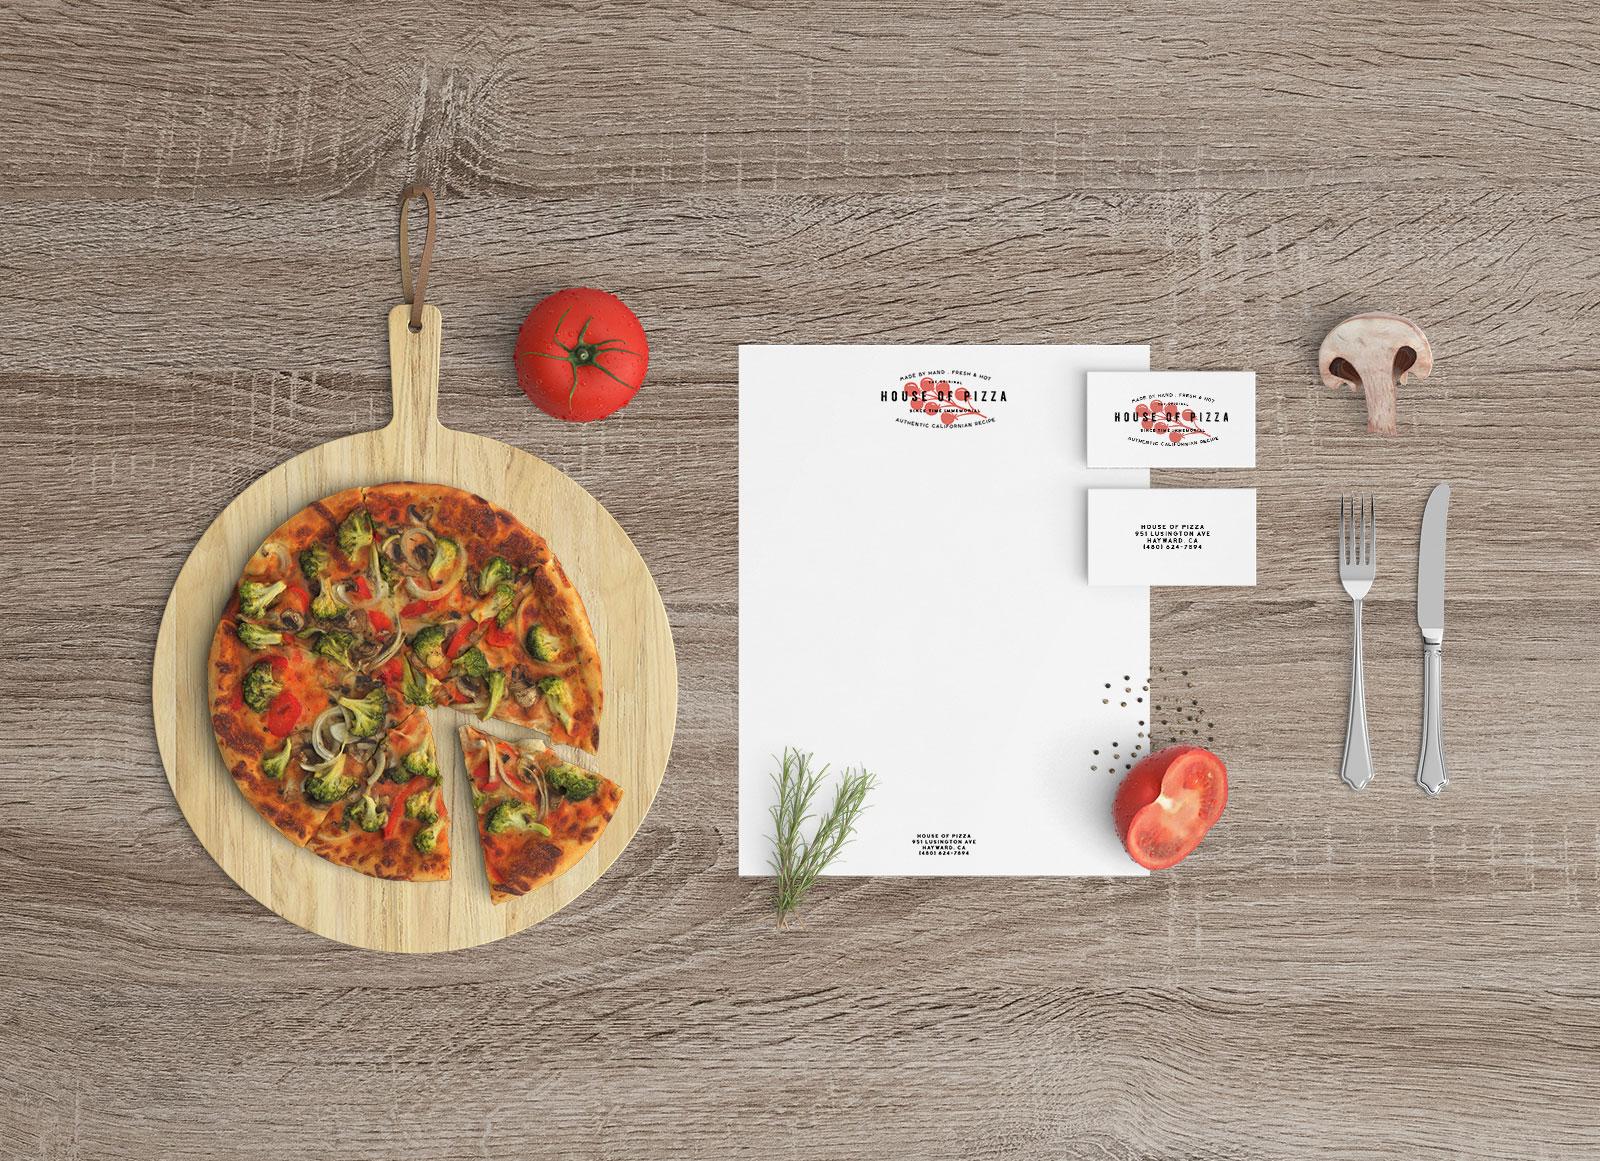 Free-Premium-Restaurant-Stationery-Mockup-PSD-2